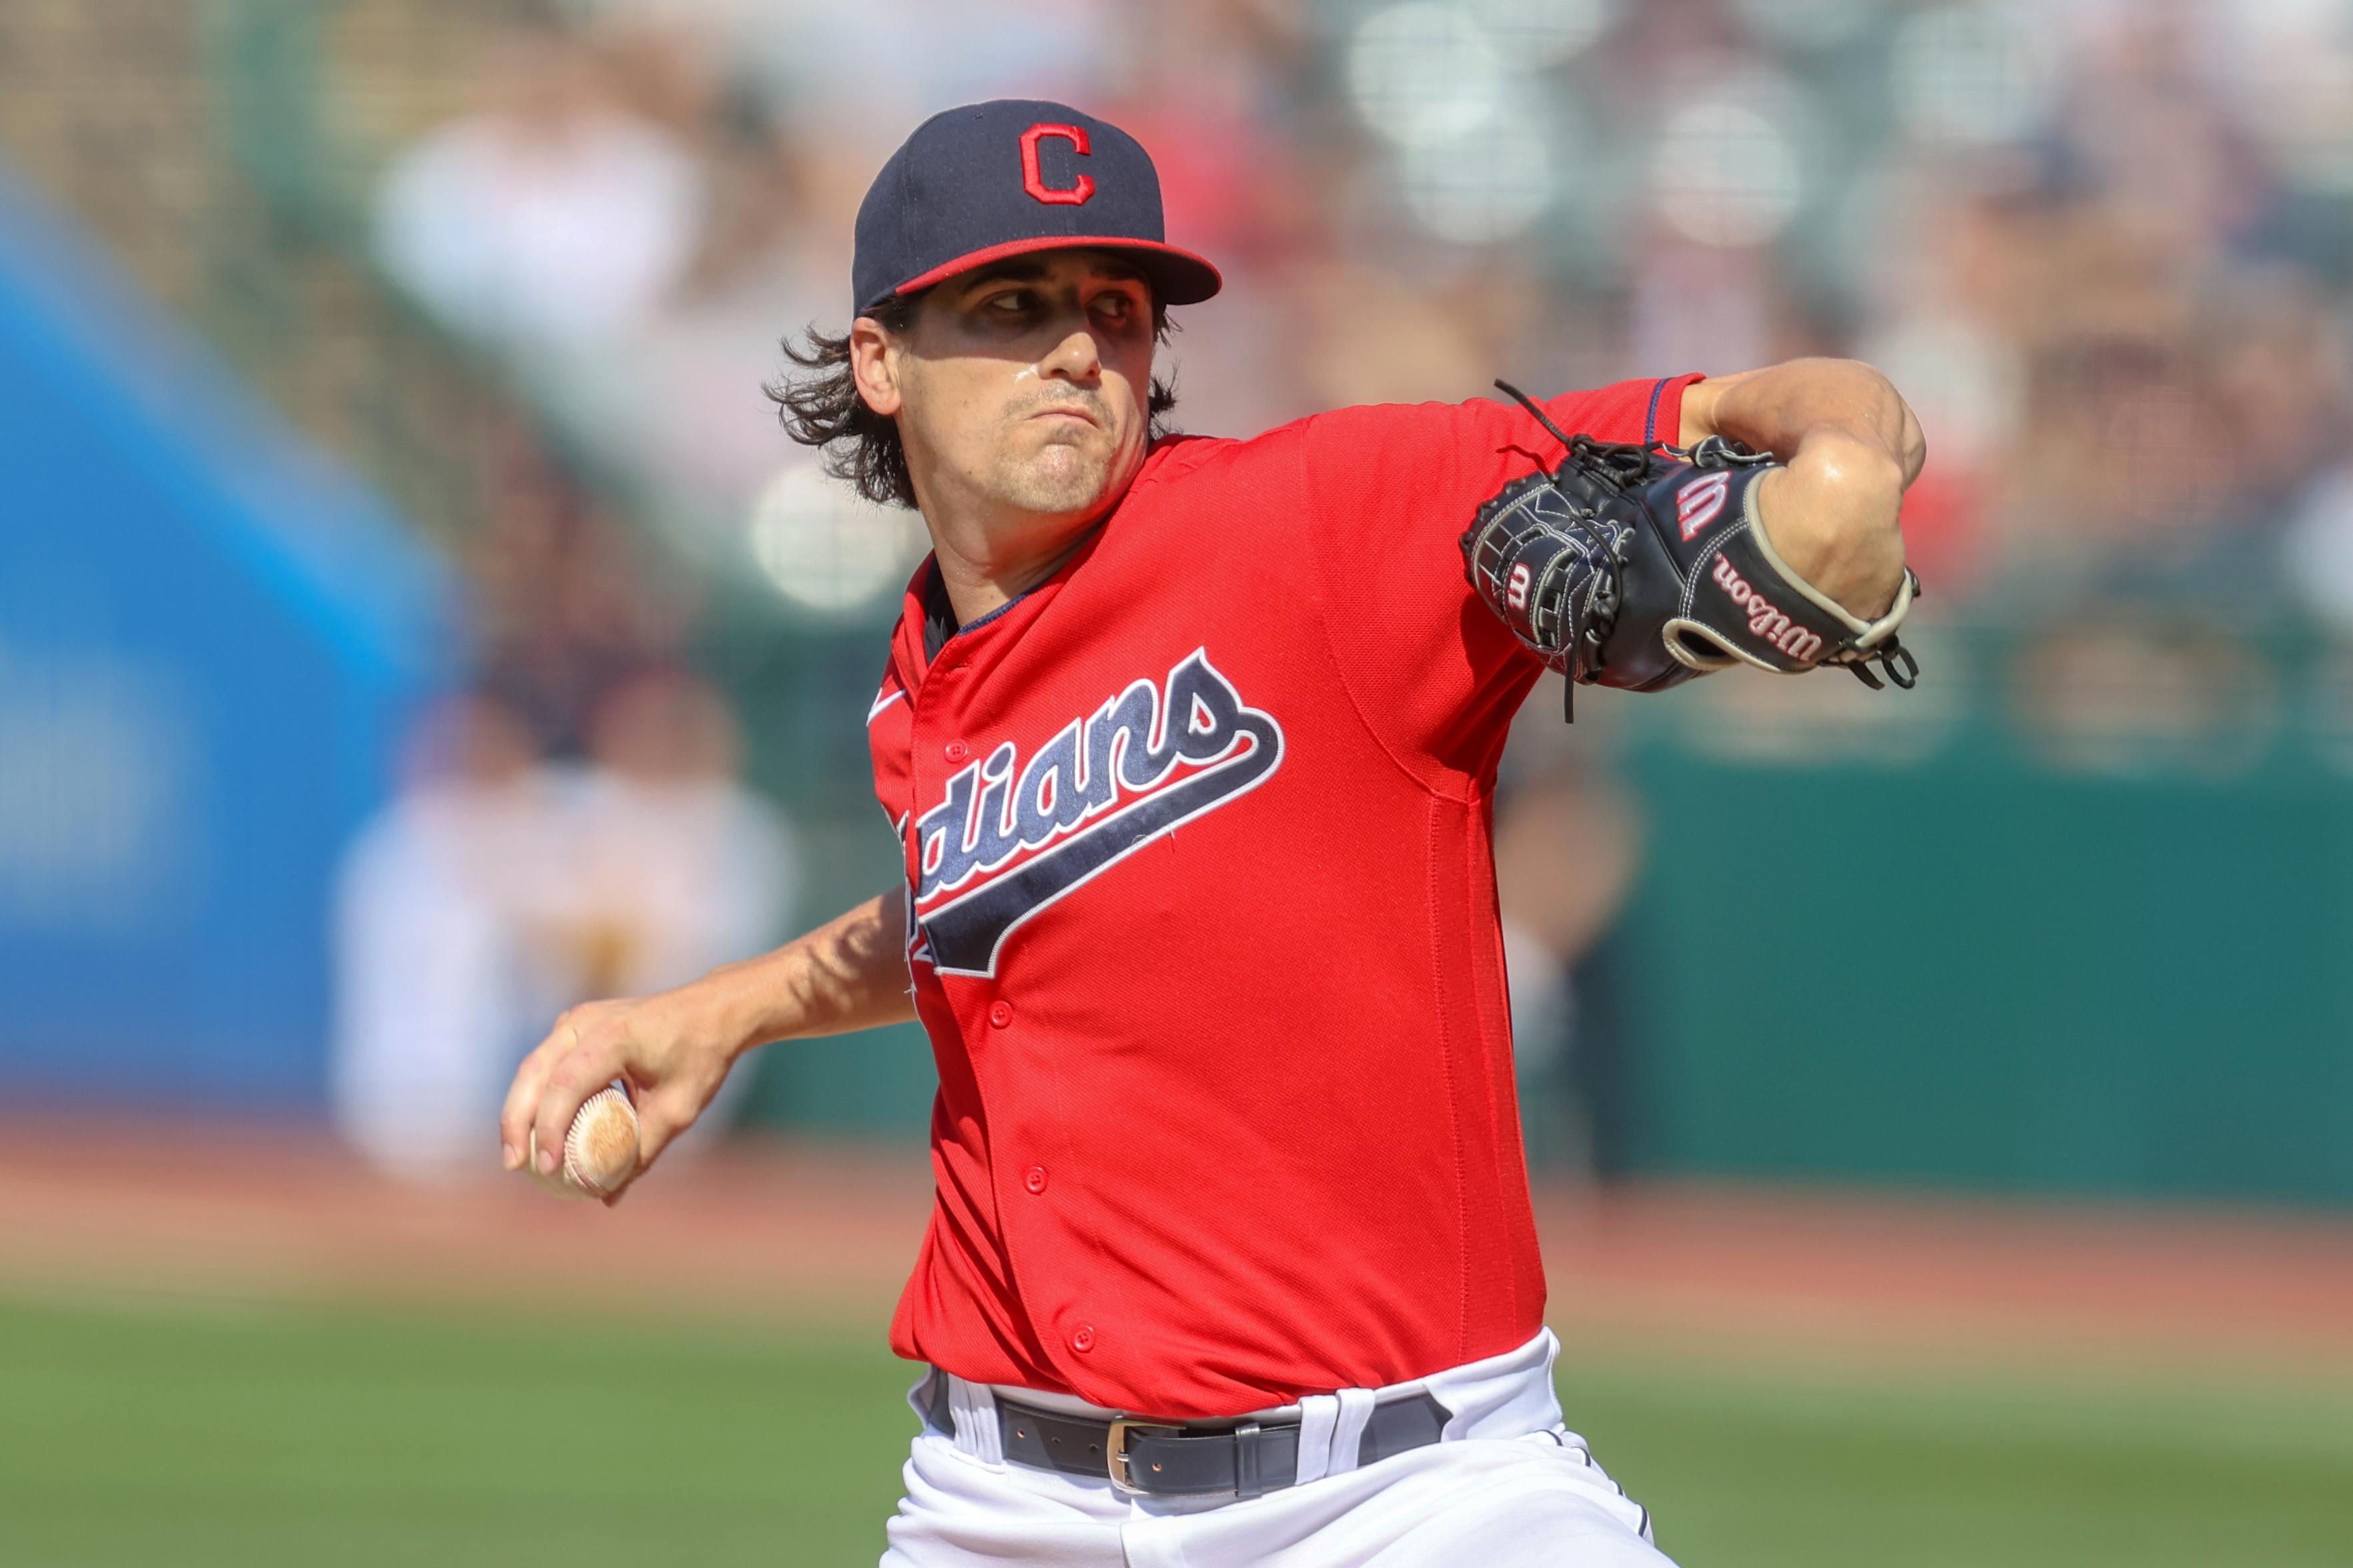 MLB: AUG 28 Red Sox at Indians